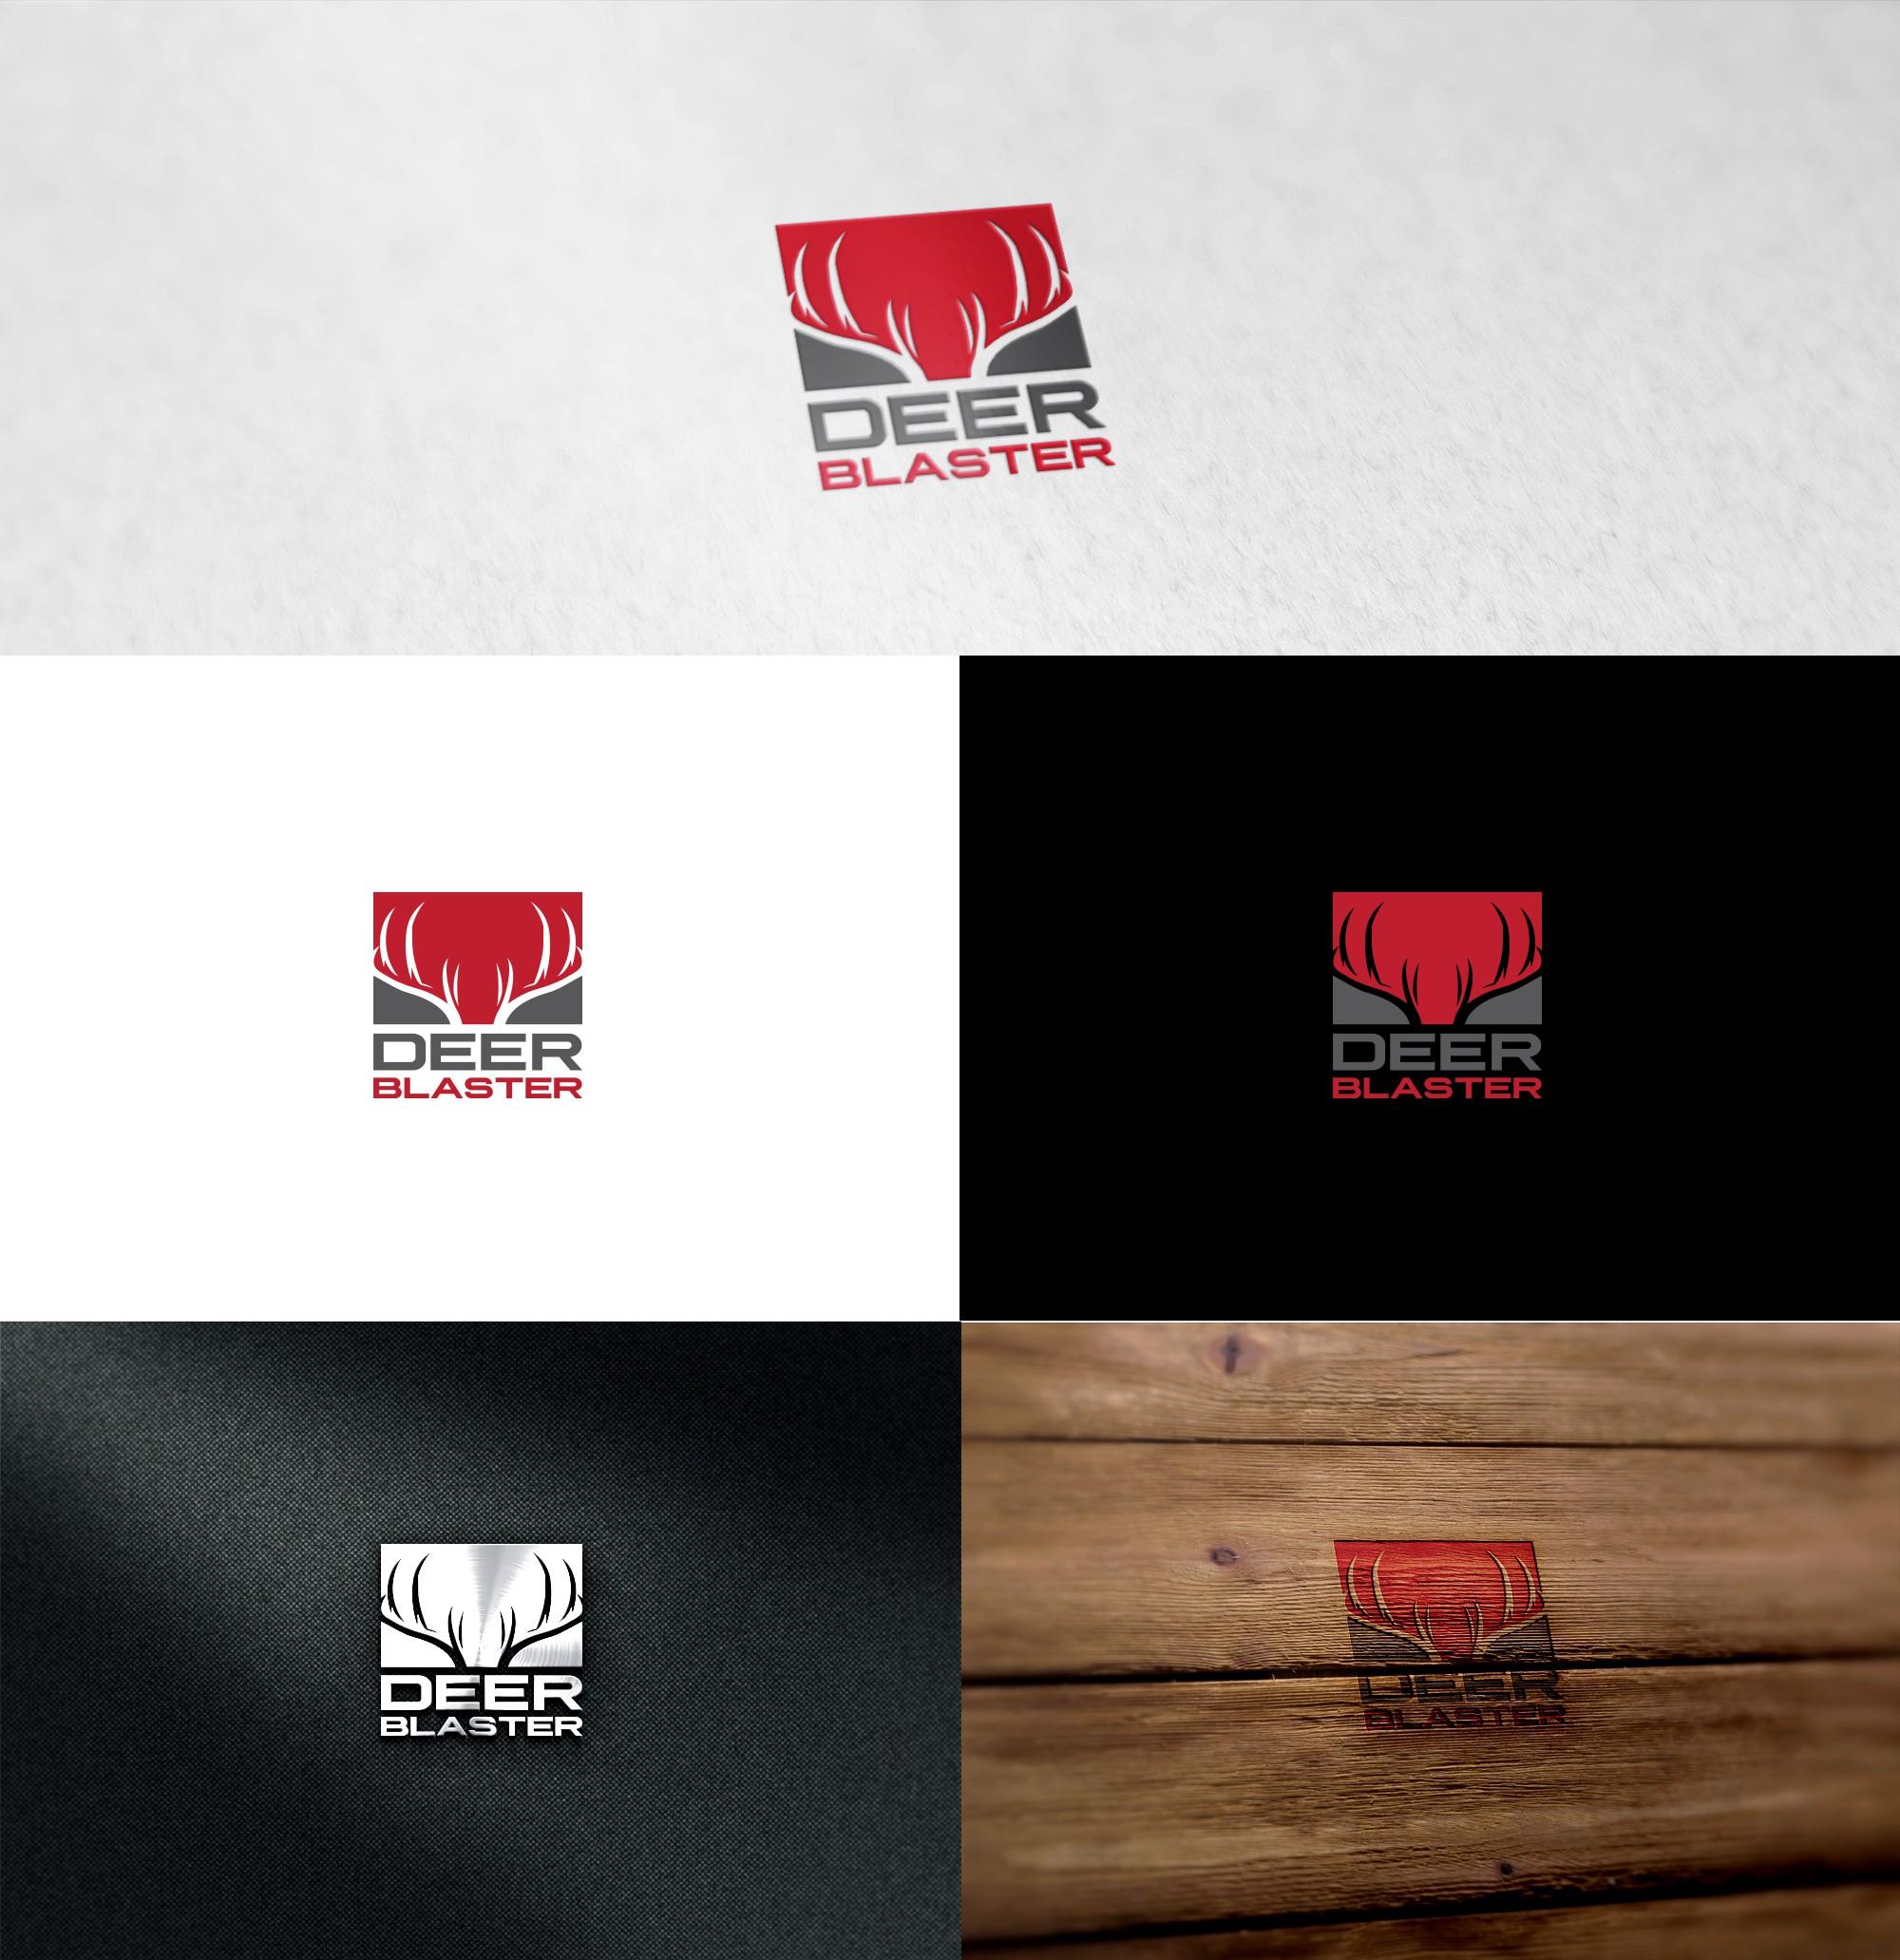 Need your help designing a distinct, simple deer/antler logo!